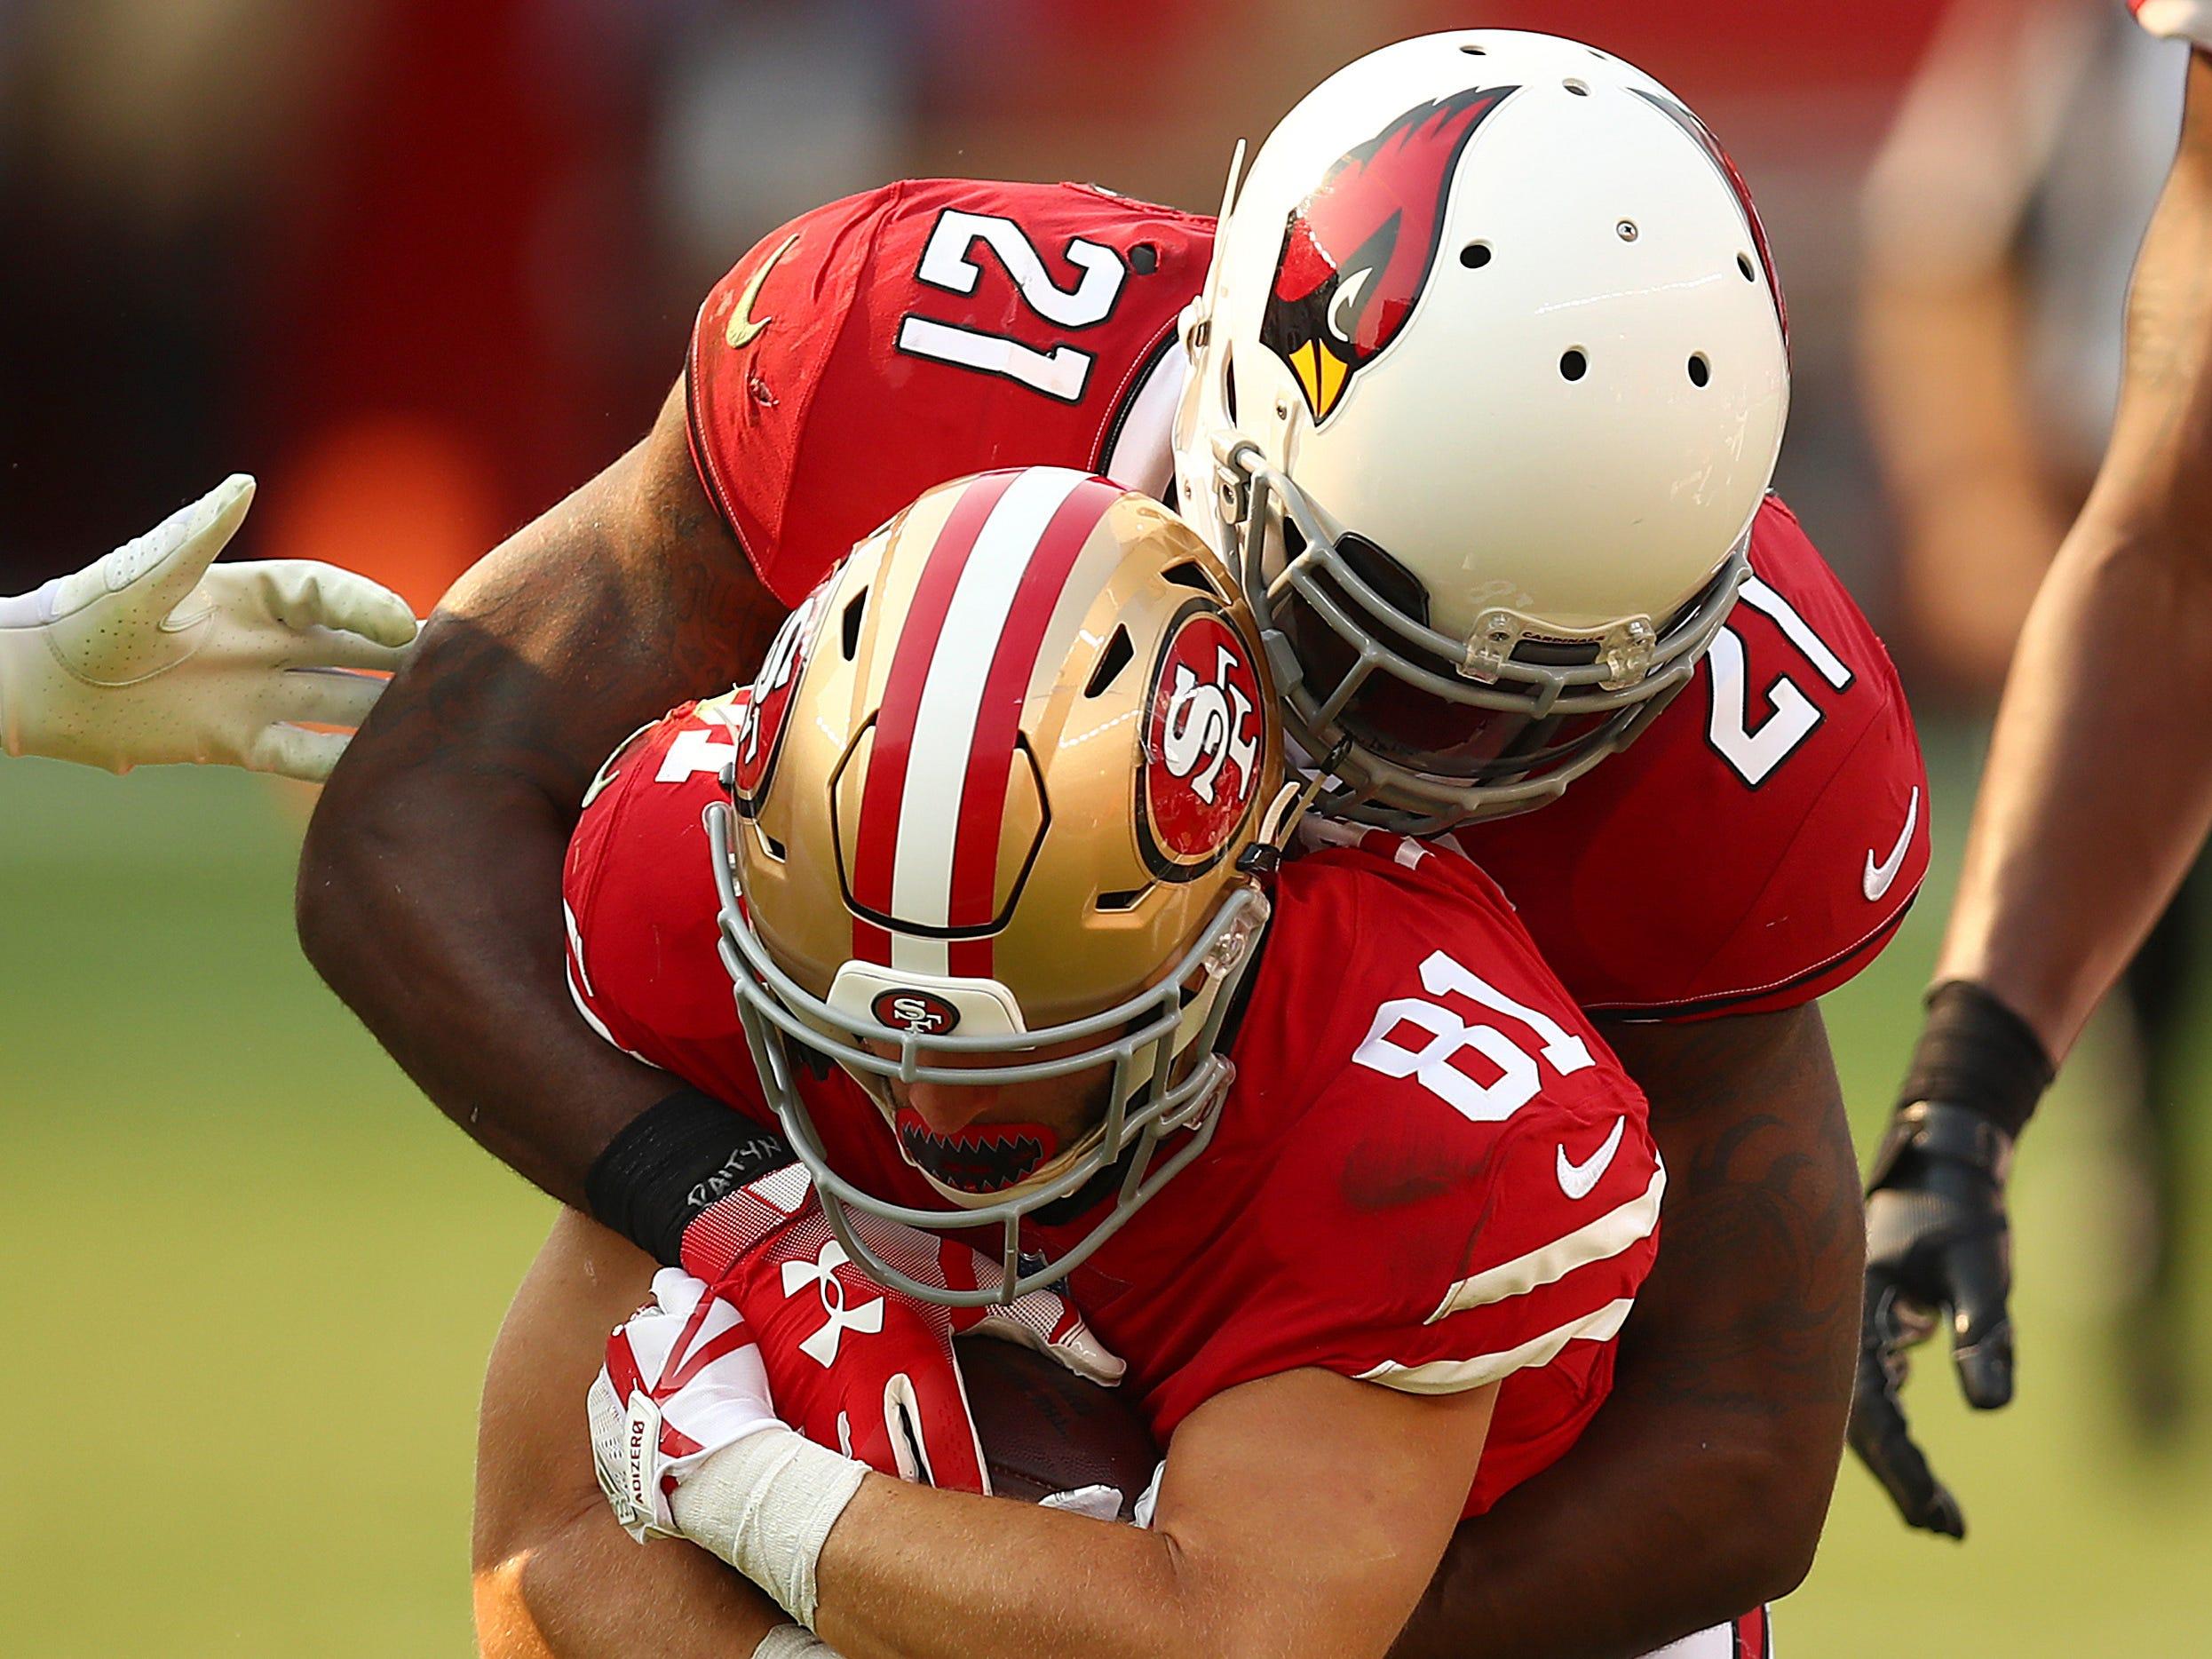 Arizona Cardinals cornerback Patrick Peterson (21) tackles San Francisco 49ers wide receiver Trent Taylor (81) during the second half of an NFL football game in Santa Clara, Calif., Sunday, Oct. 7, 2018.